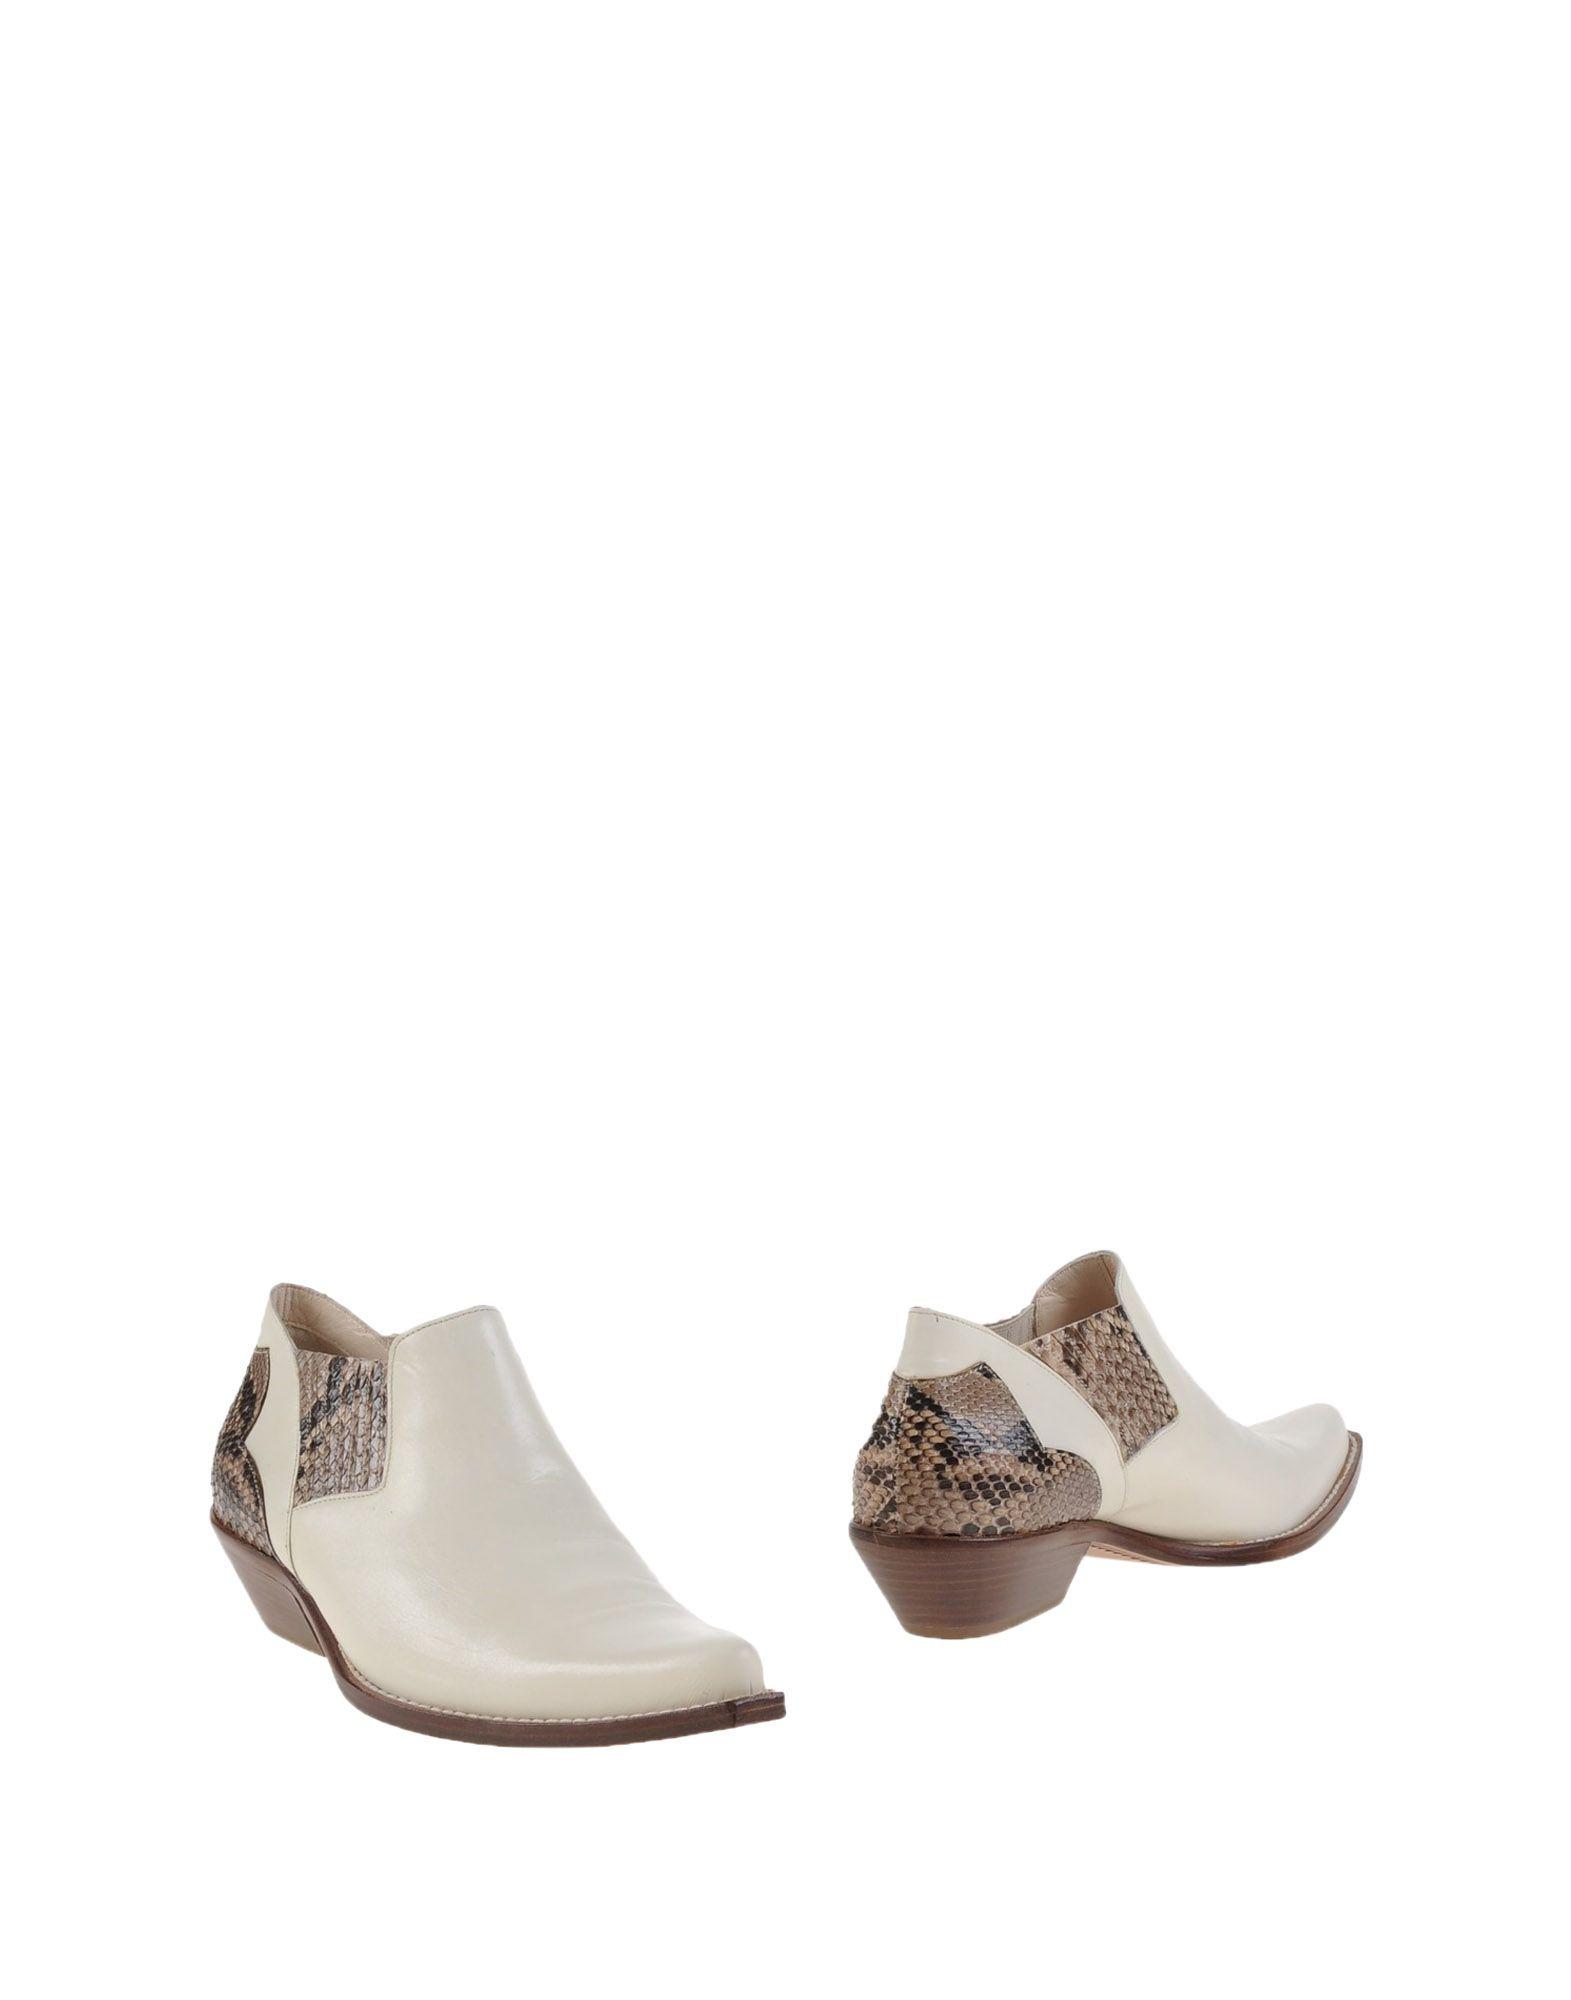 Duccio Del Duca Stiefelette Damen  11123184UK Gute Qualität beliebte Schuhe